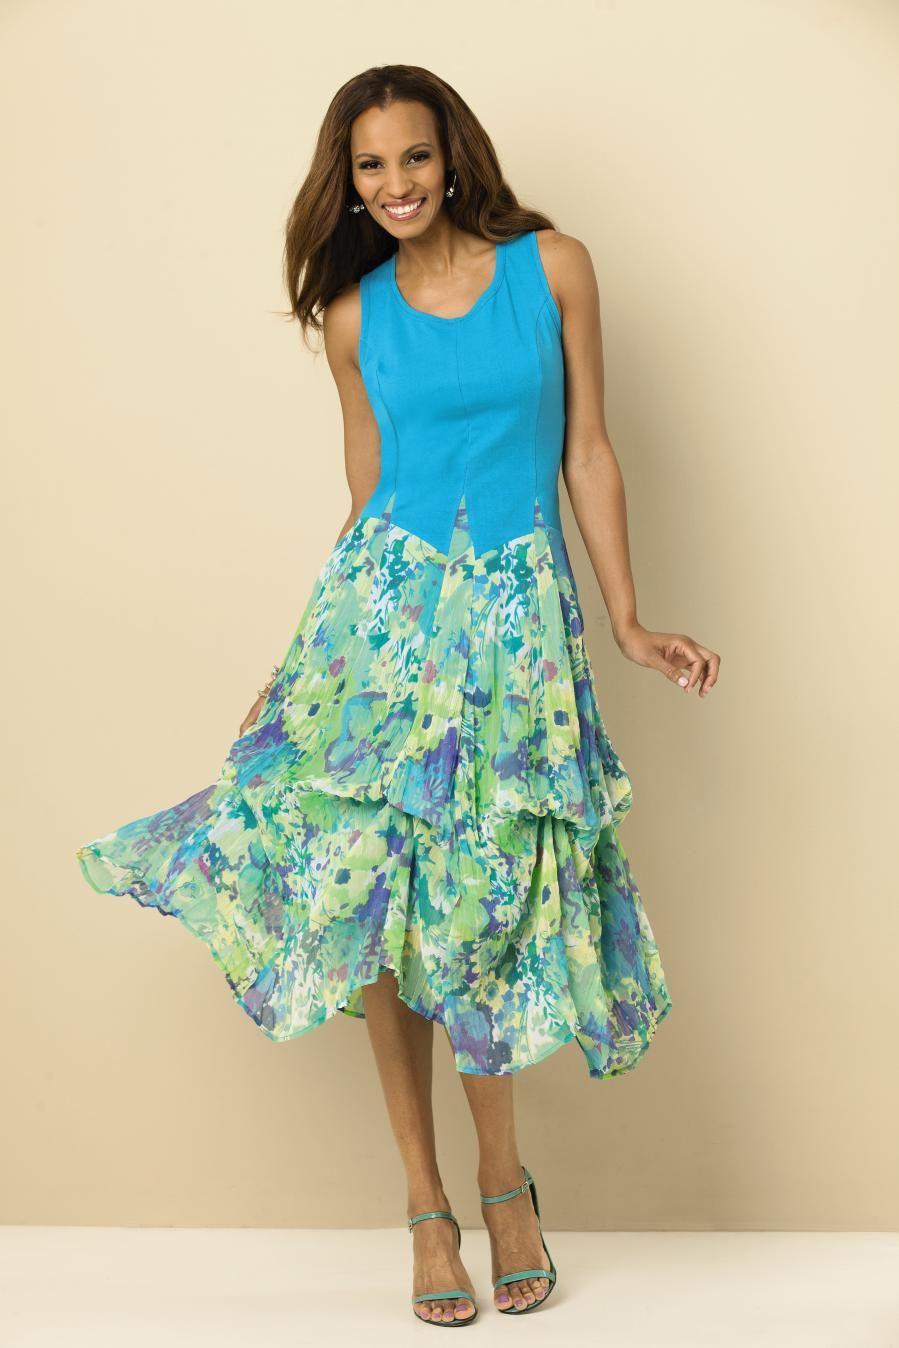 650817d837af Stein Mart Gowns